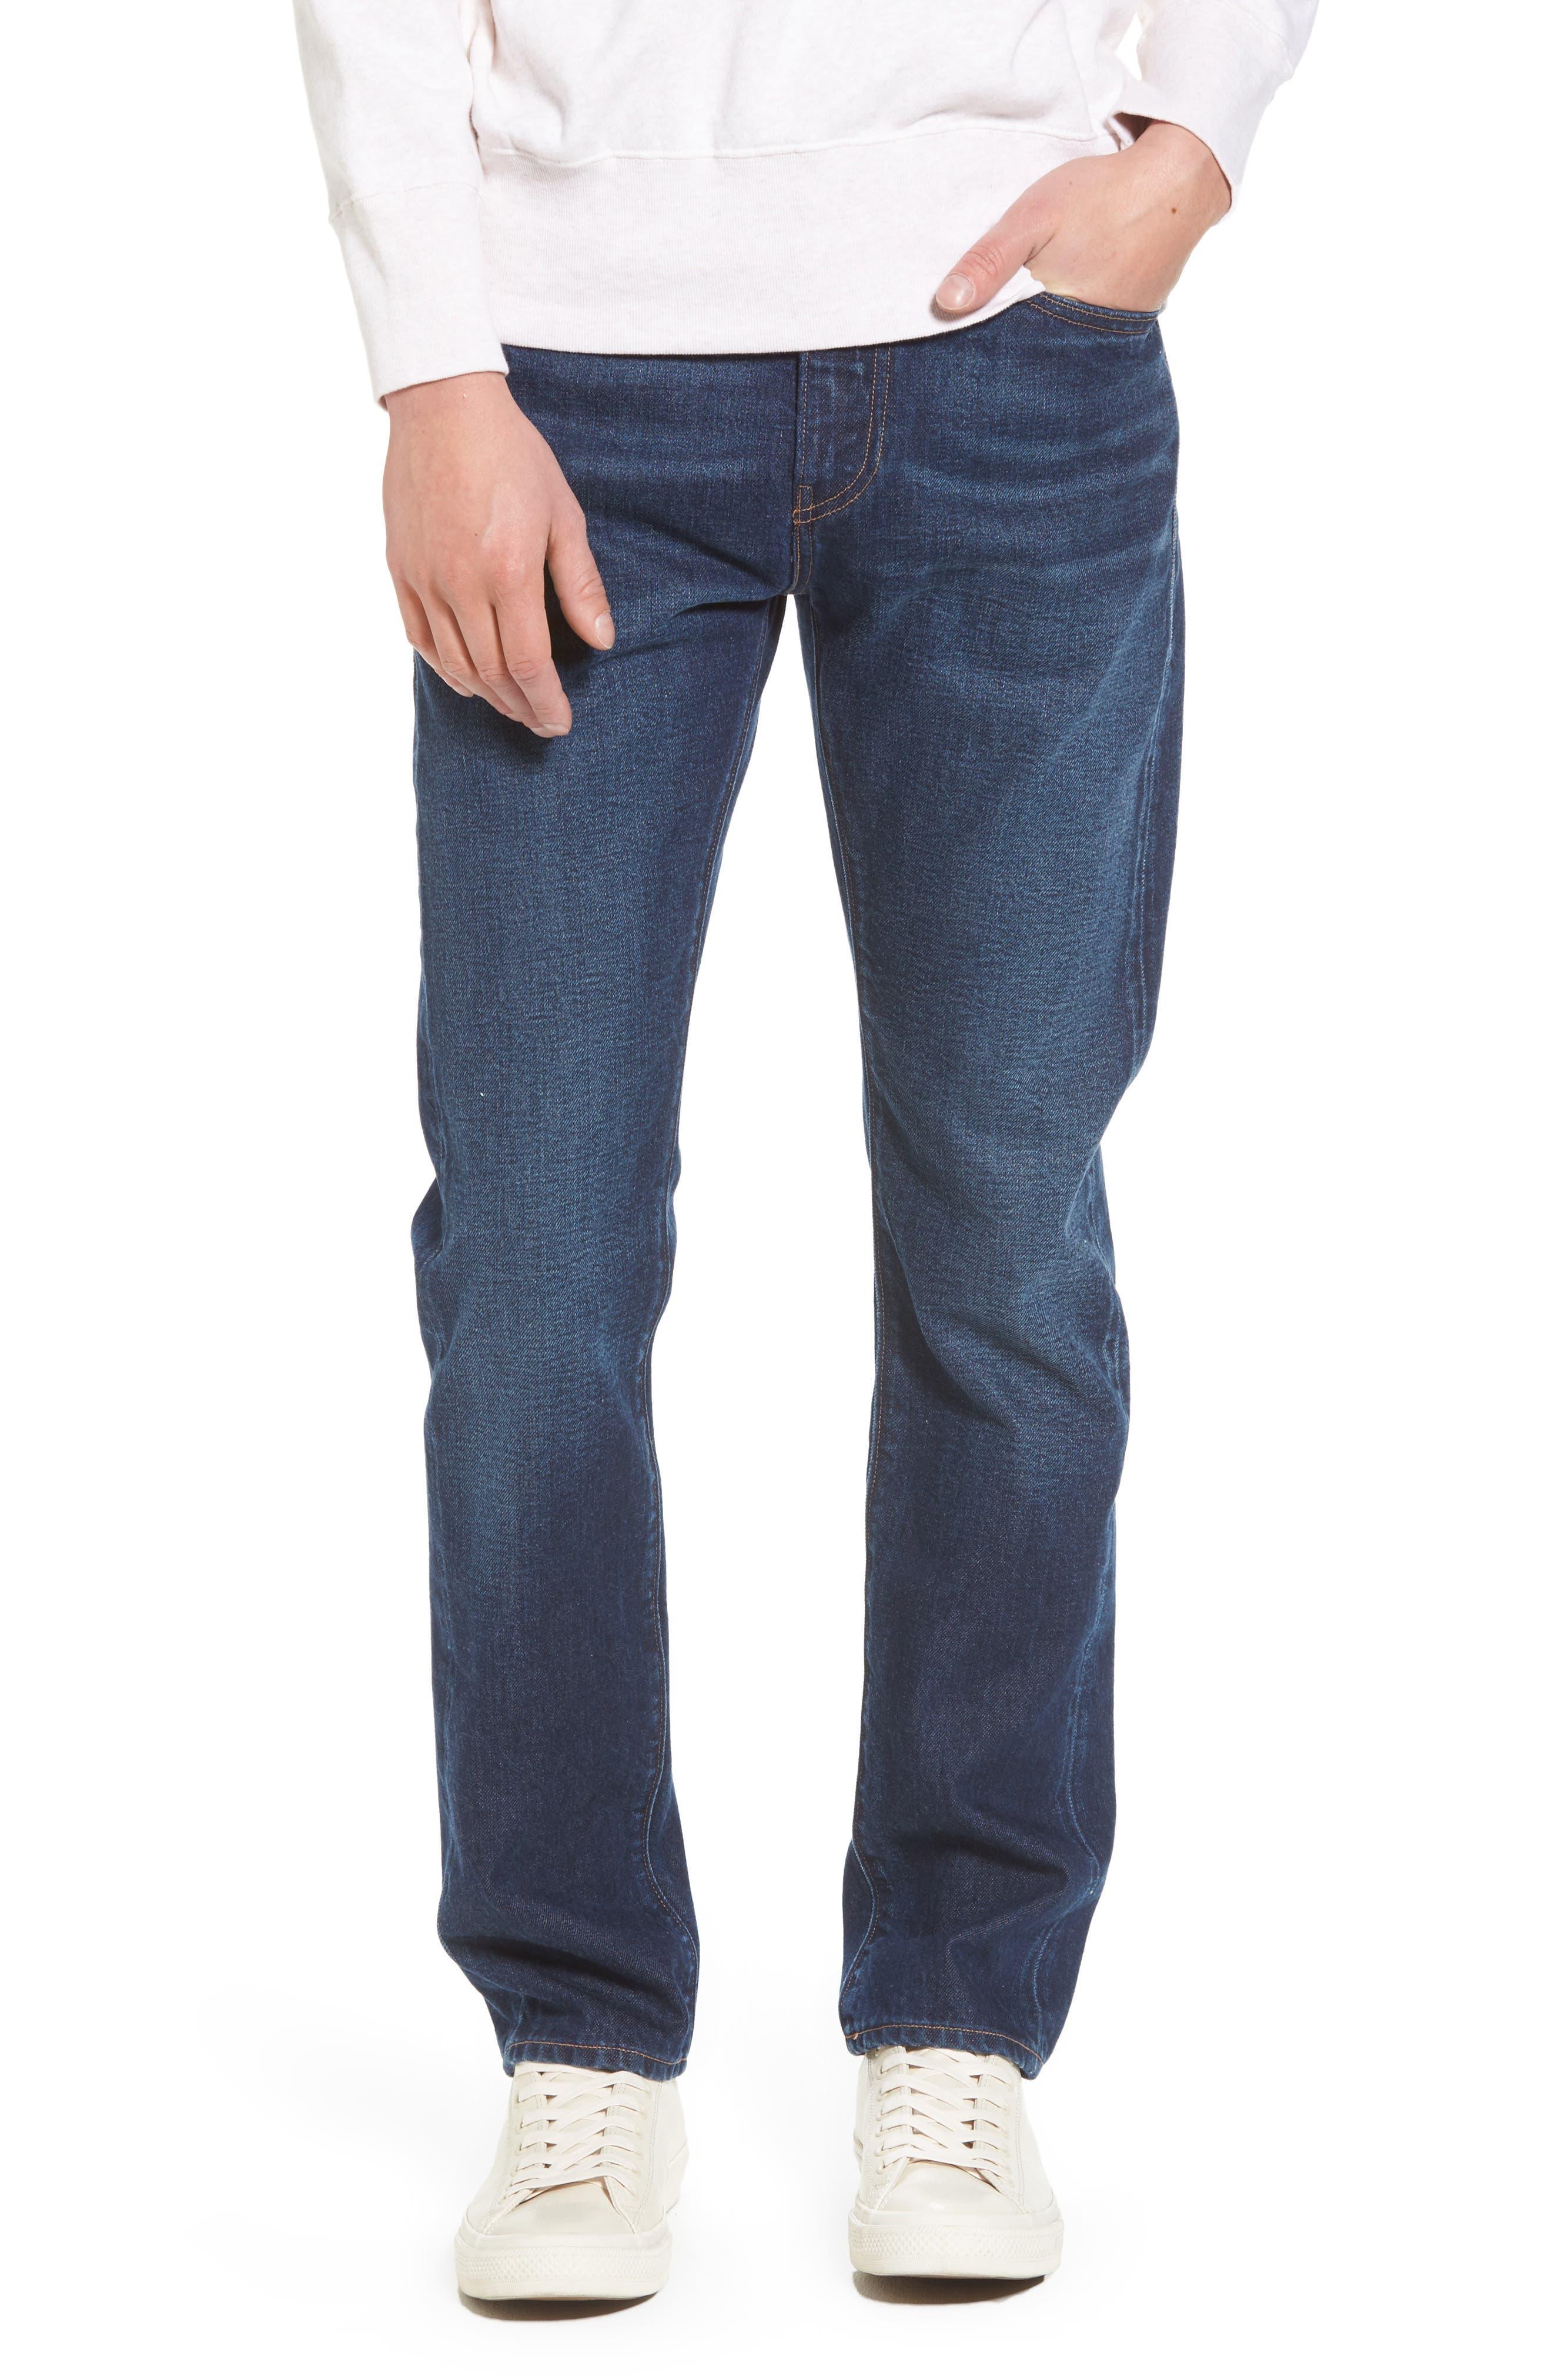 Tack Slim Fit Jeans,                             Main thumbnail 1, color,                             401